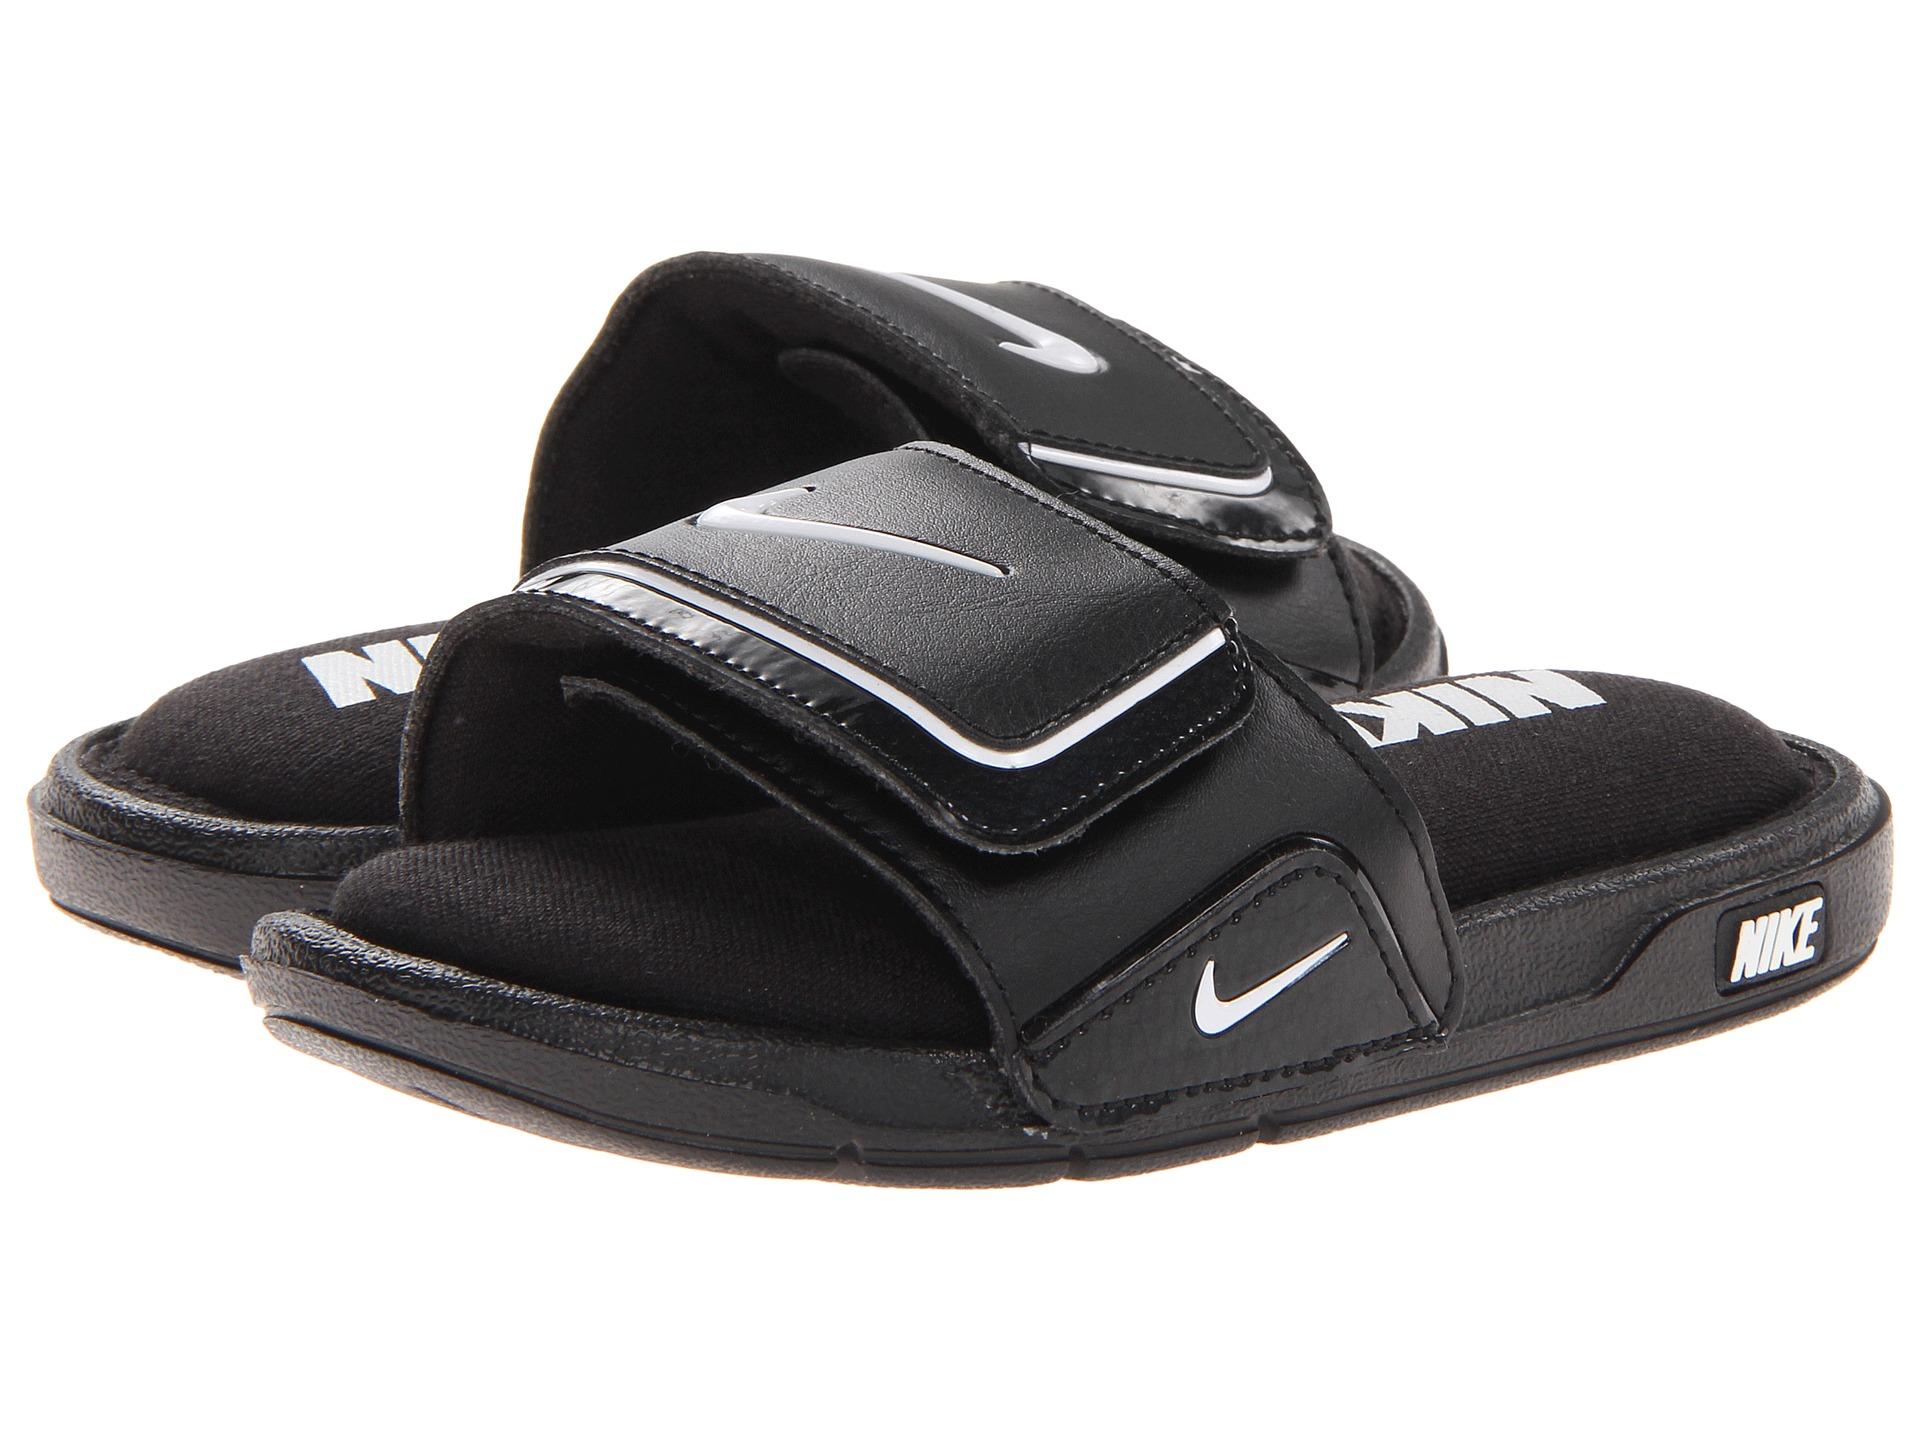 Nike Slides Deals On 1001 Blocks